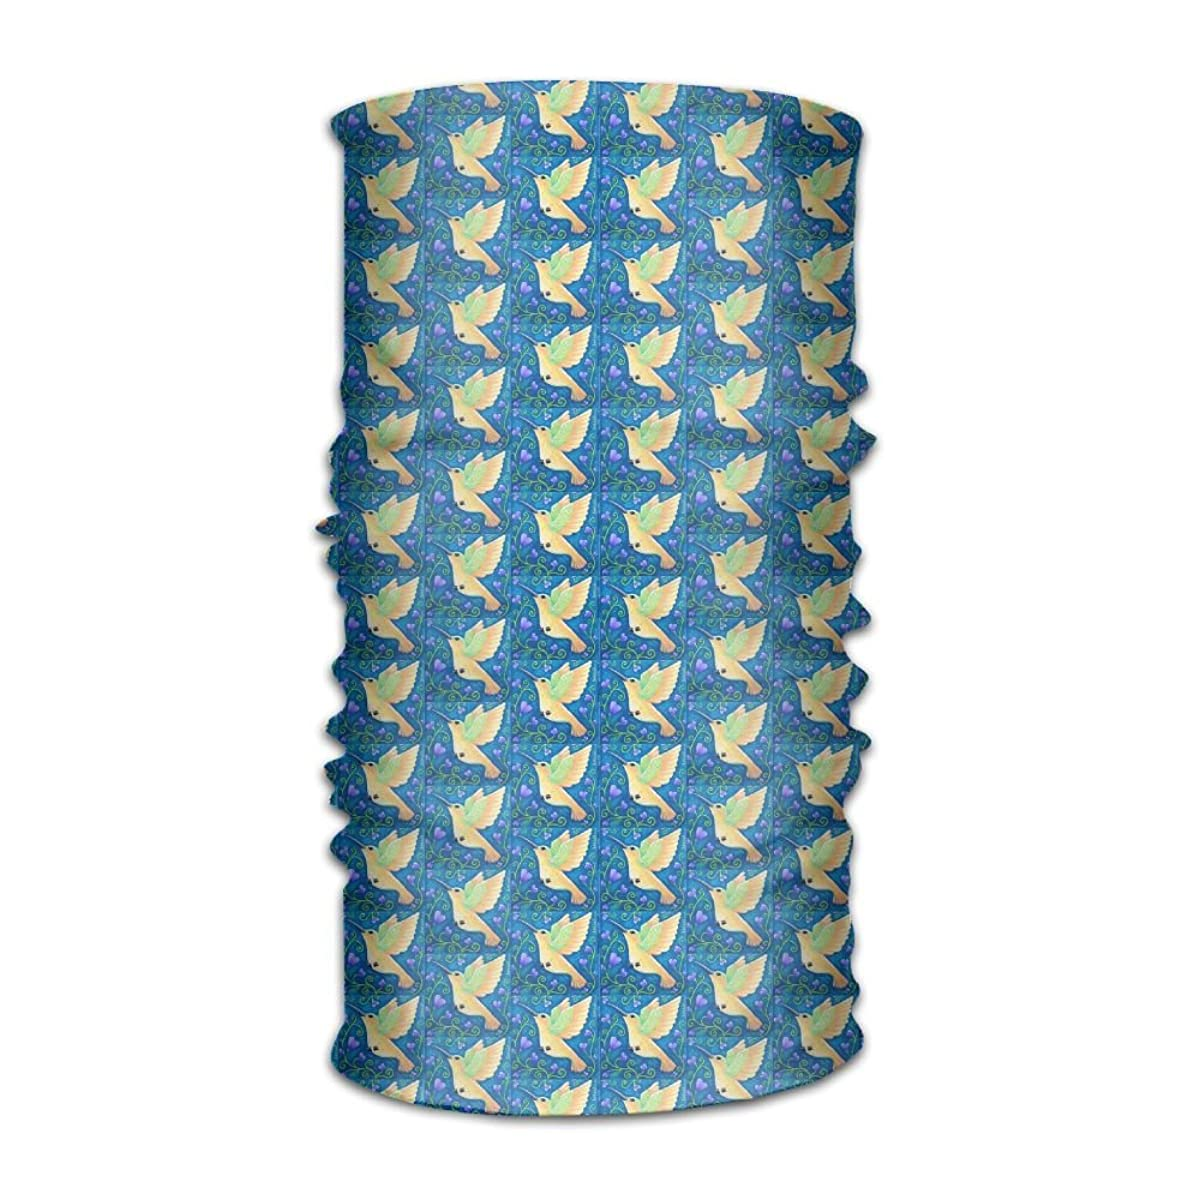 Bing4Bing Unisex Bandanas Balaclava Cap Turban Headscarf Sweatband Headwear Headscarf Hummingbird